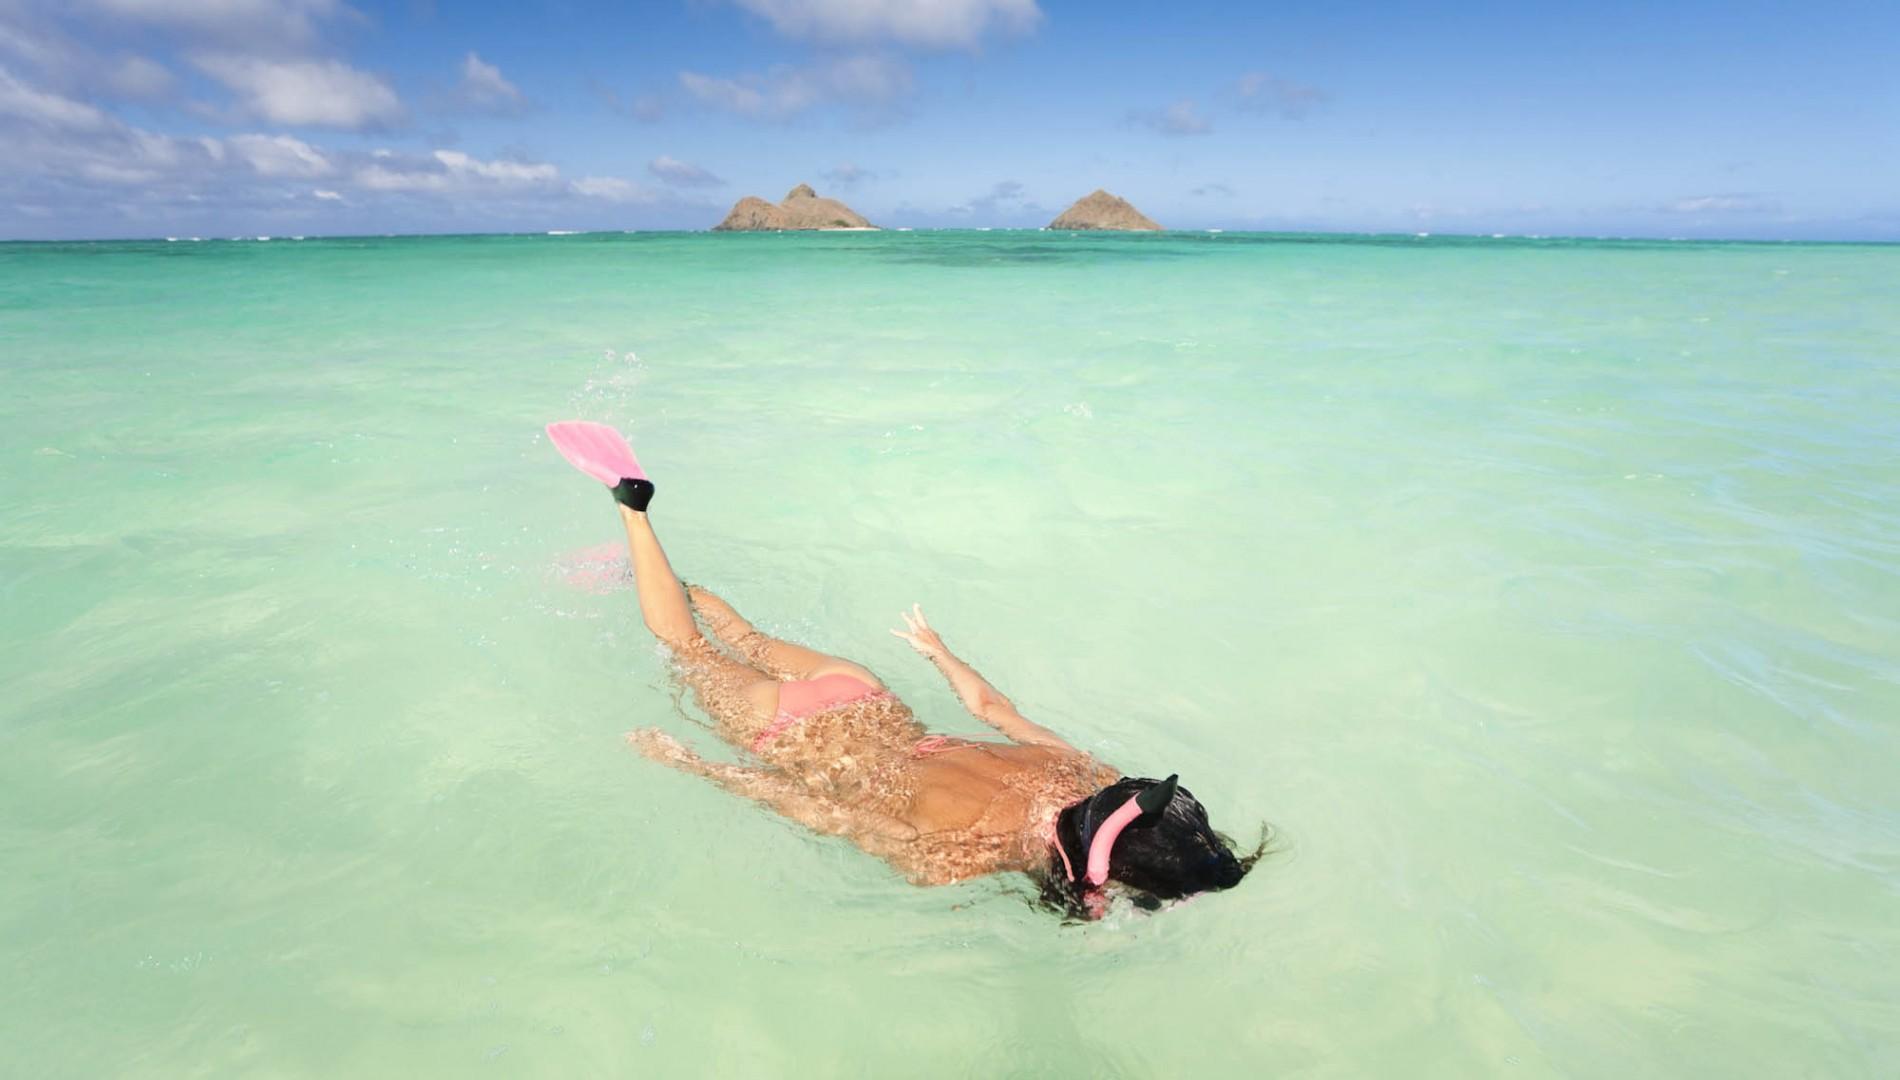 Lanikai-beach-Hawaii-127071696-1900x1080_c